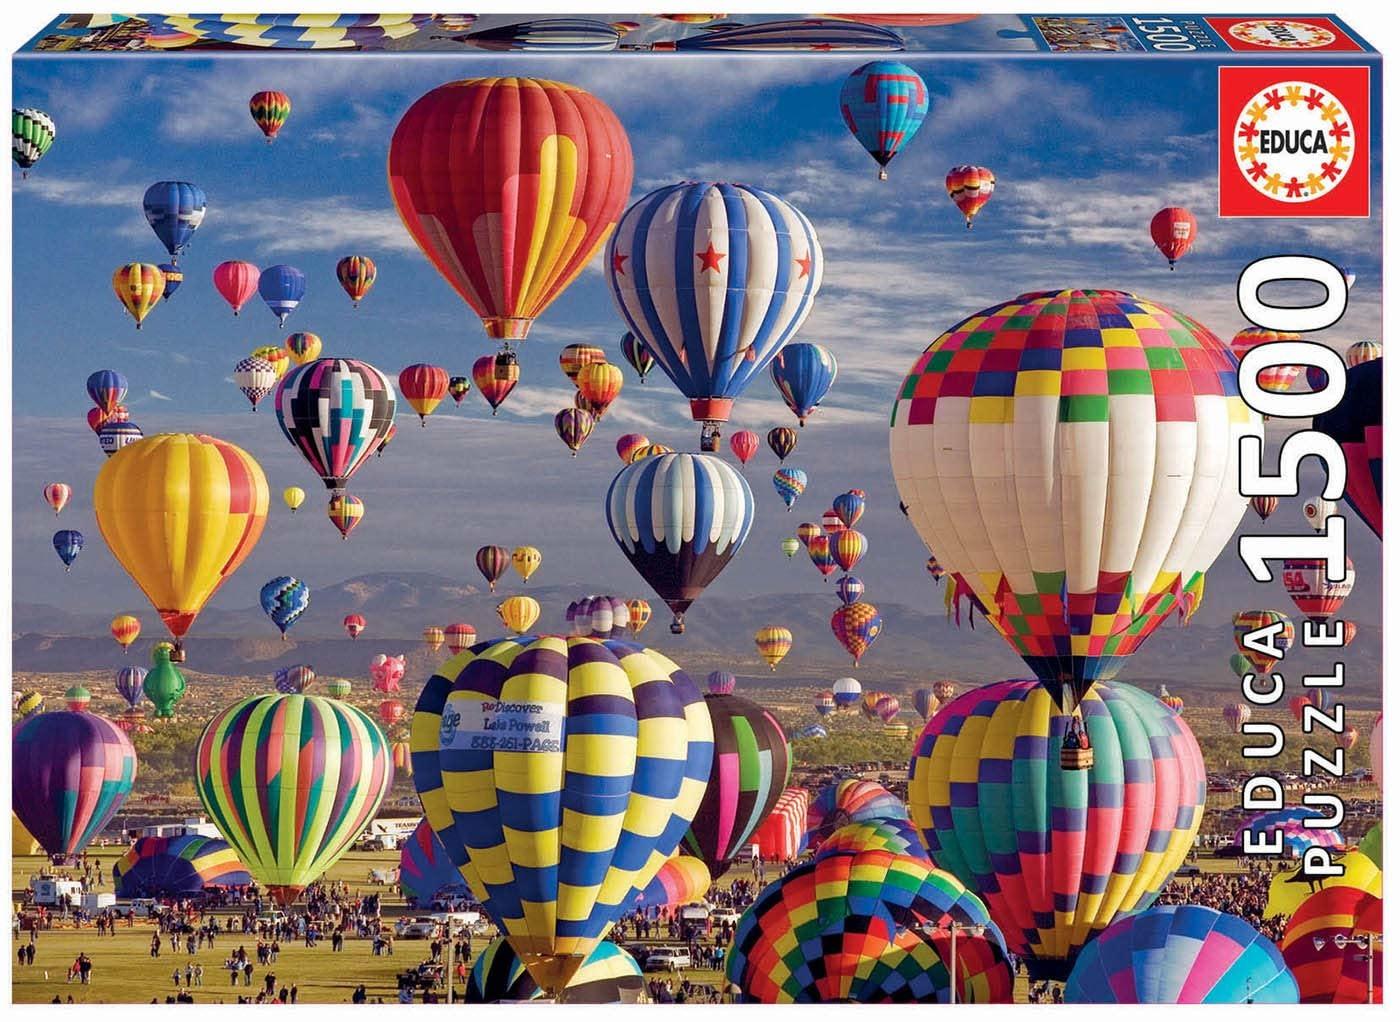 JOHN HANSEN COMPANY ED1500 HOT AIR BALLOONS